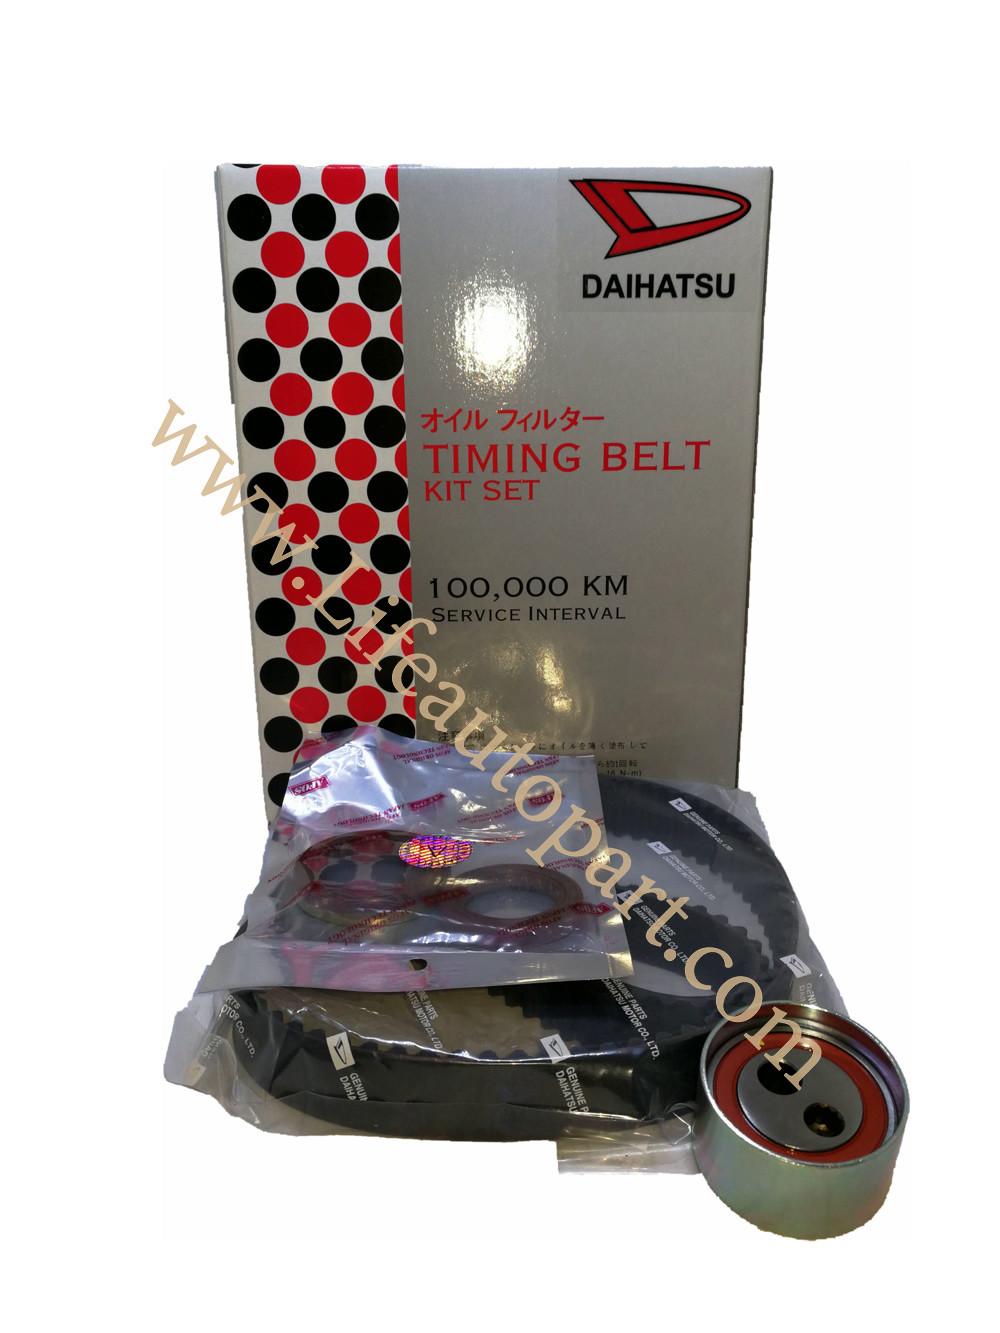 medium resolution of daihatsu timing belt